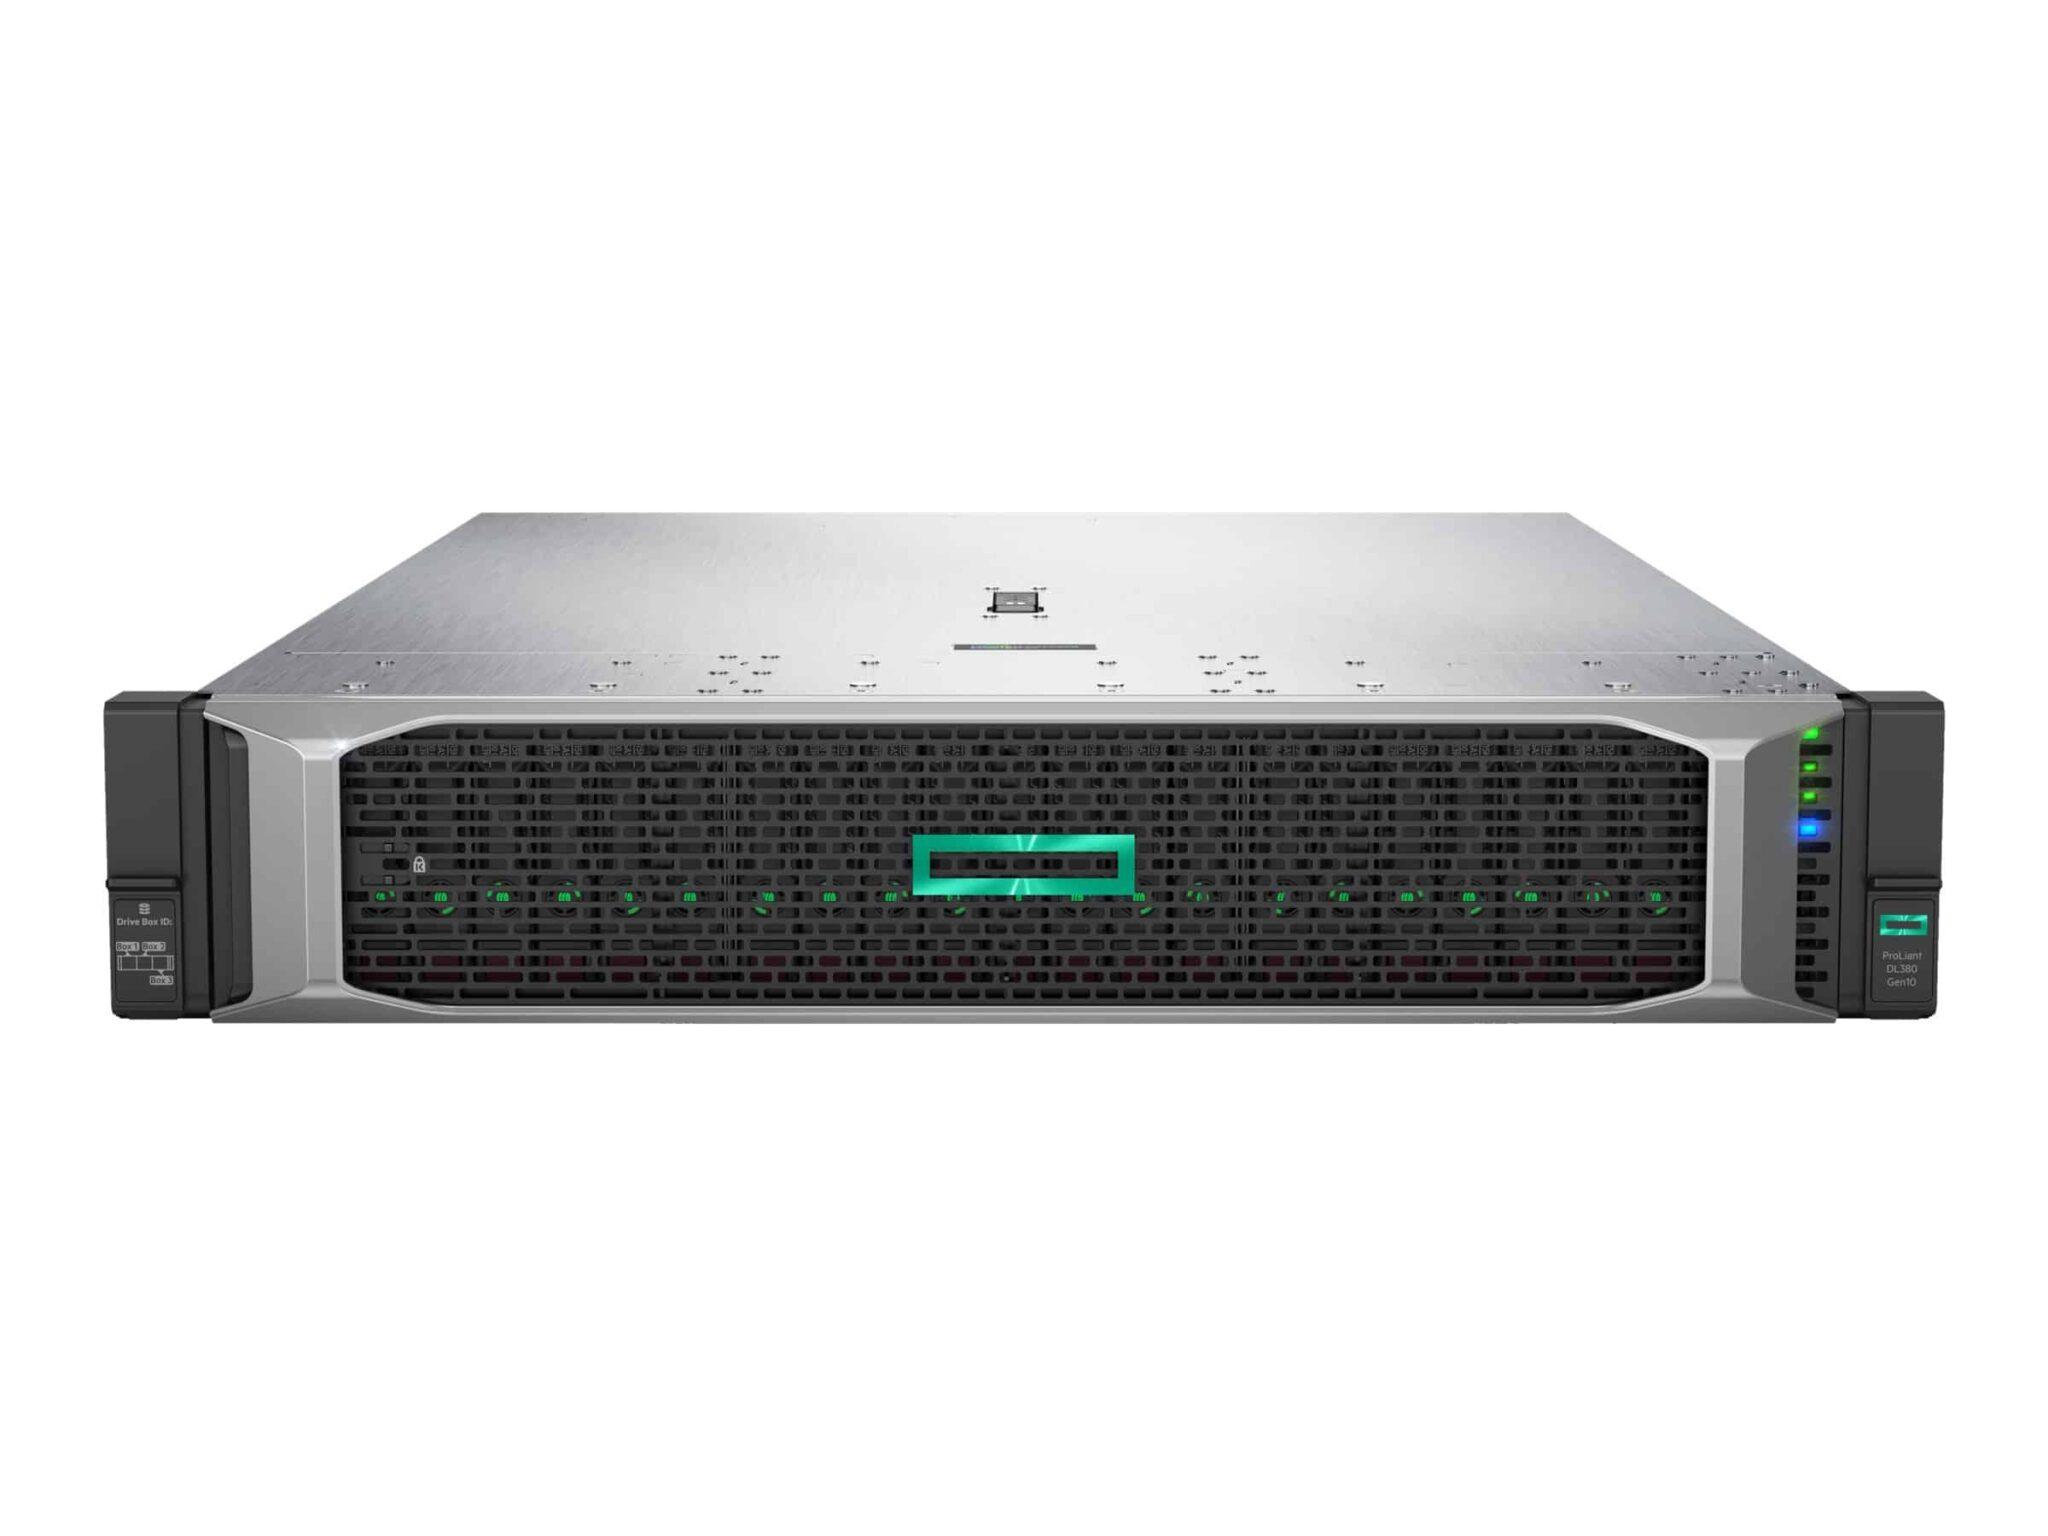 HPE-DL380-Gen10-6126-1P-32GB-8SFF-Server-Smart-Buy